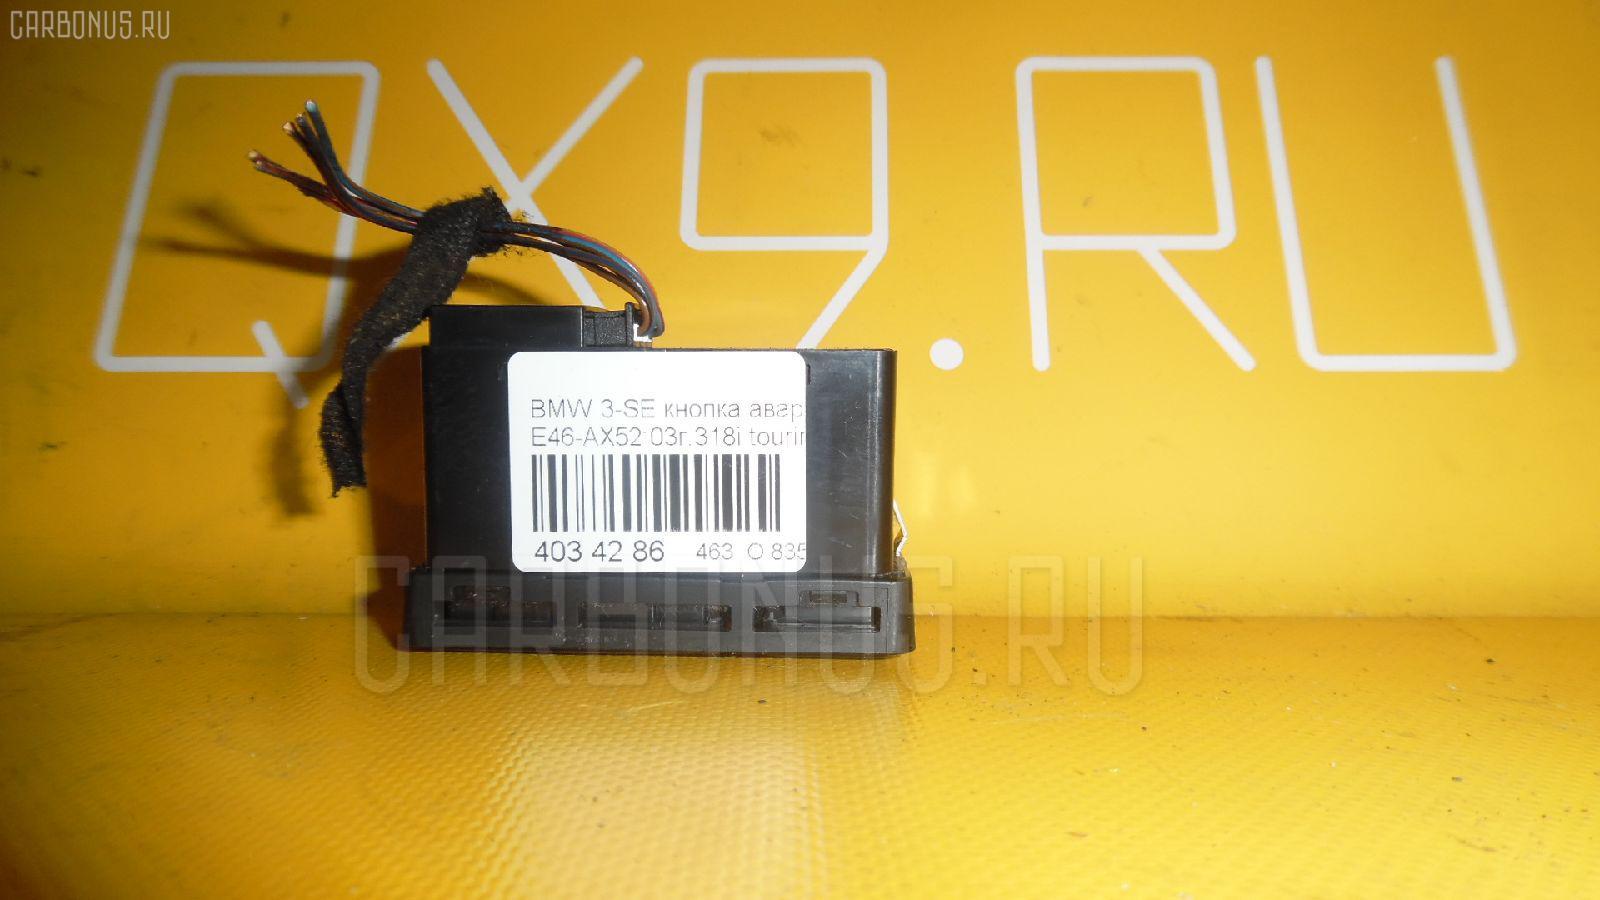 Кнопка аварийной остановки BMW 3-SERIES E46-AX52 Фото 1